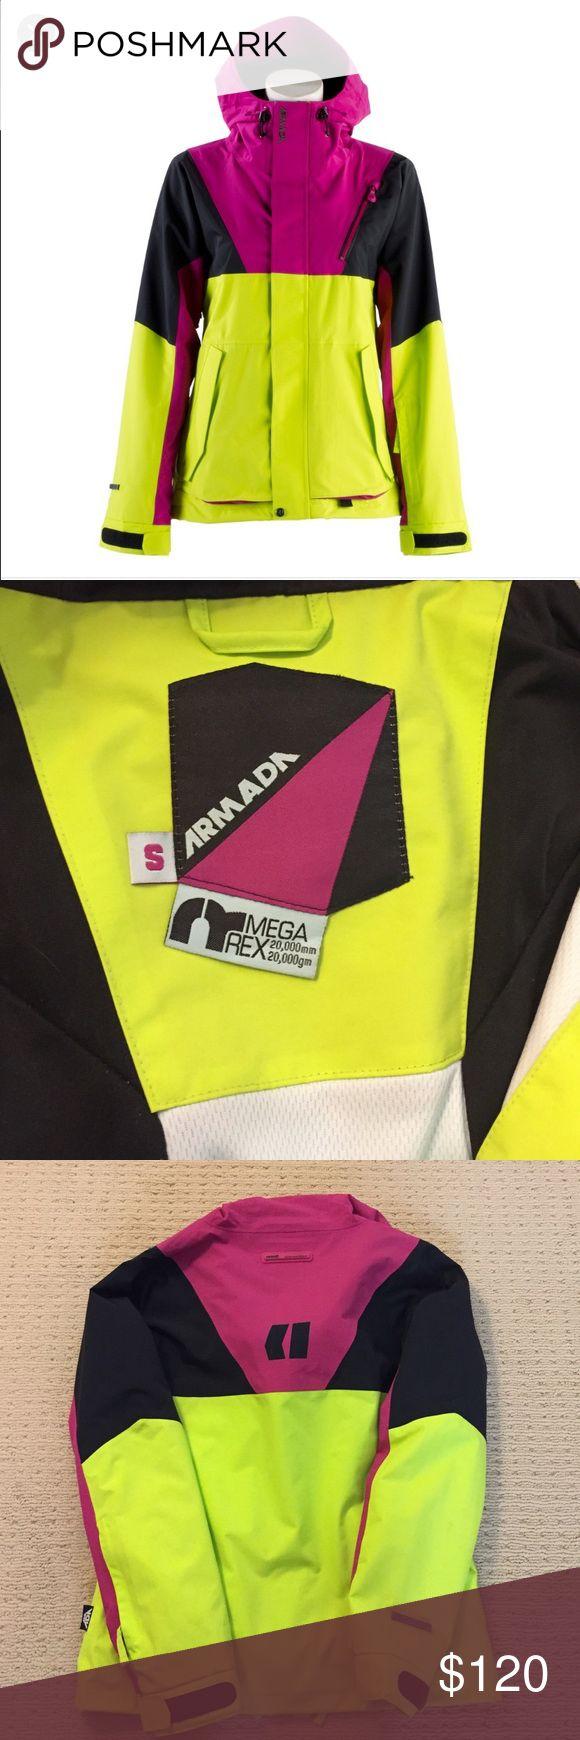 Armada Ski Jacket - SZ S - Great Condition. Armada Ski Jacket - Black, Pink, Yellow - S - Great Condition. Armada Jackets & Coats